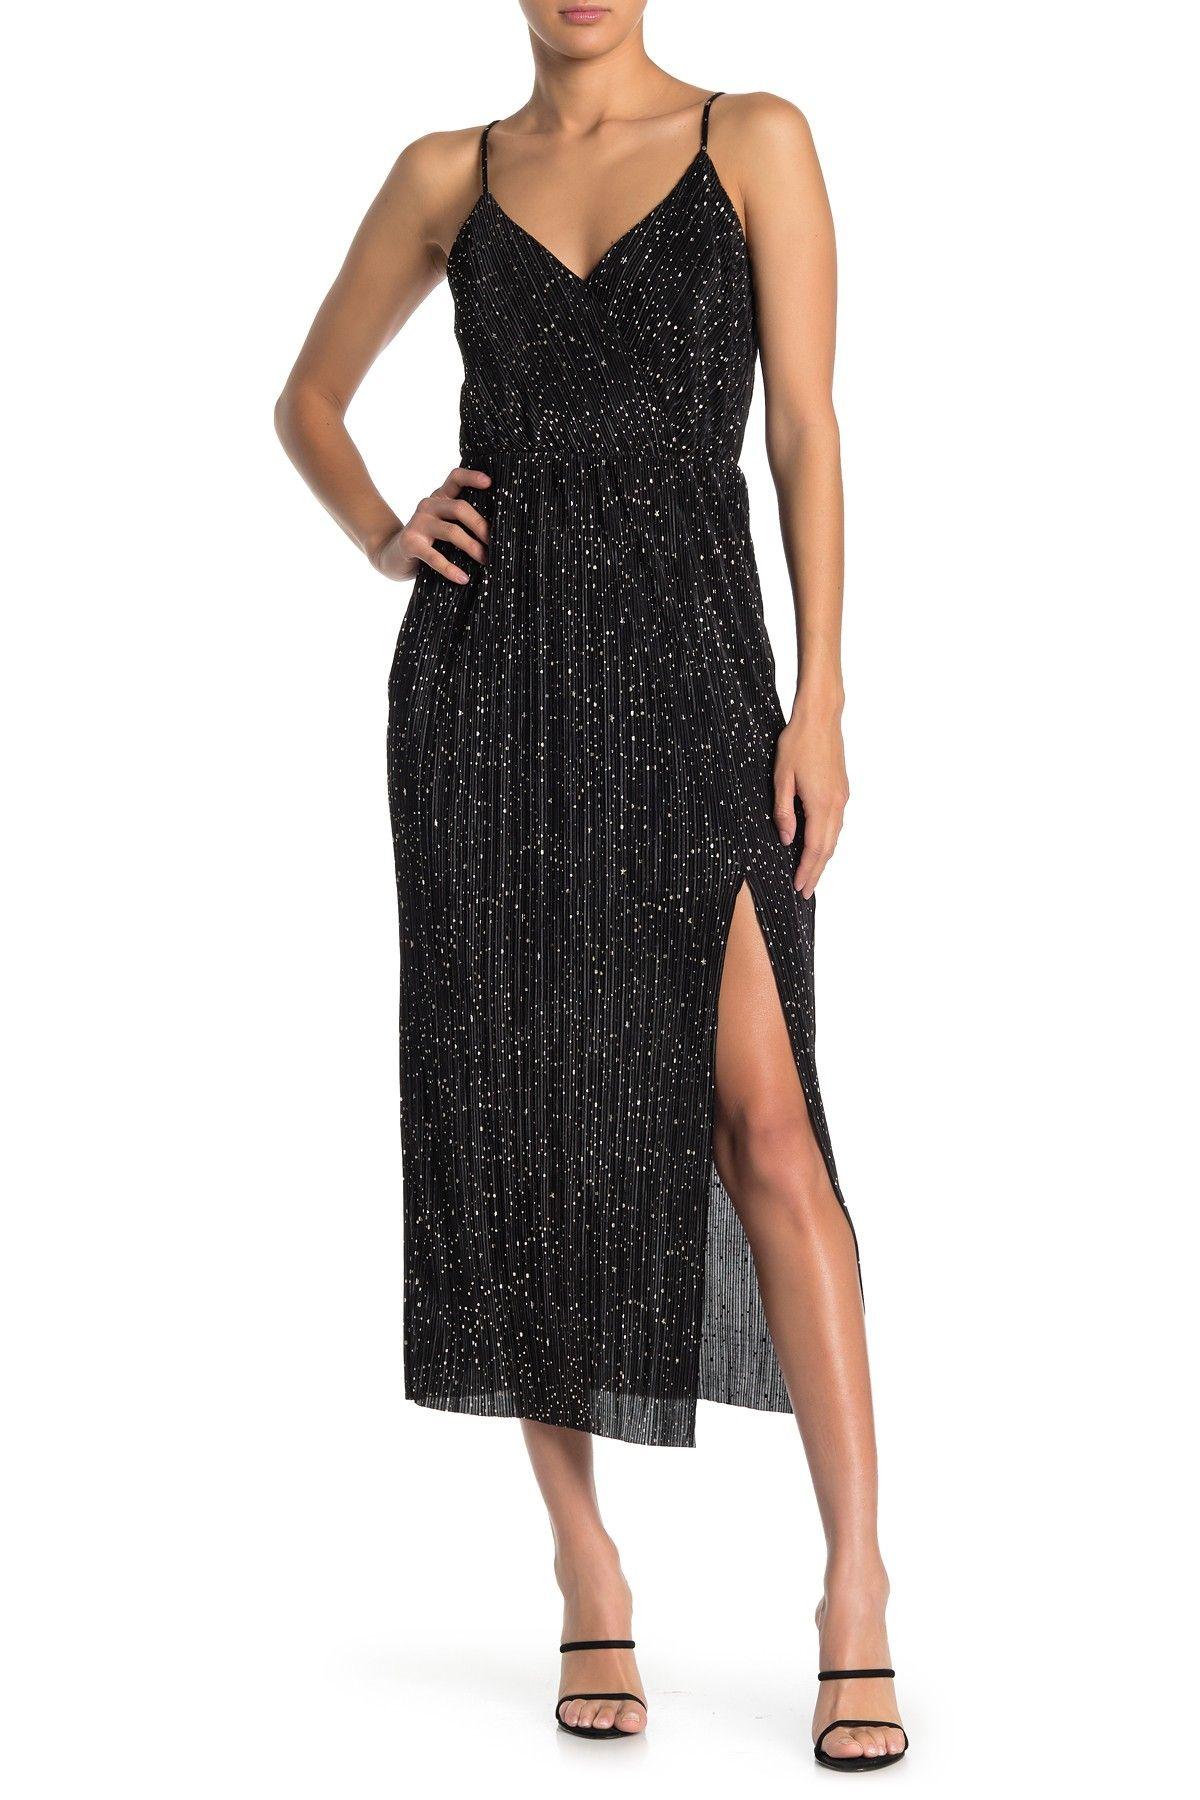 Lush Metallic Star Print Pleated Faux Wrap Midi Dress Nordstrom Rack Nordstrom Dresses Midi Dress Dresses [ 1800 x 1200 Pixel ]